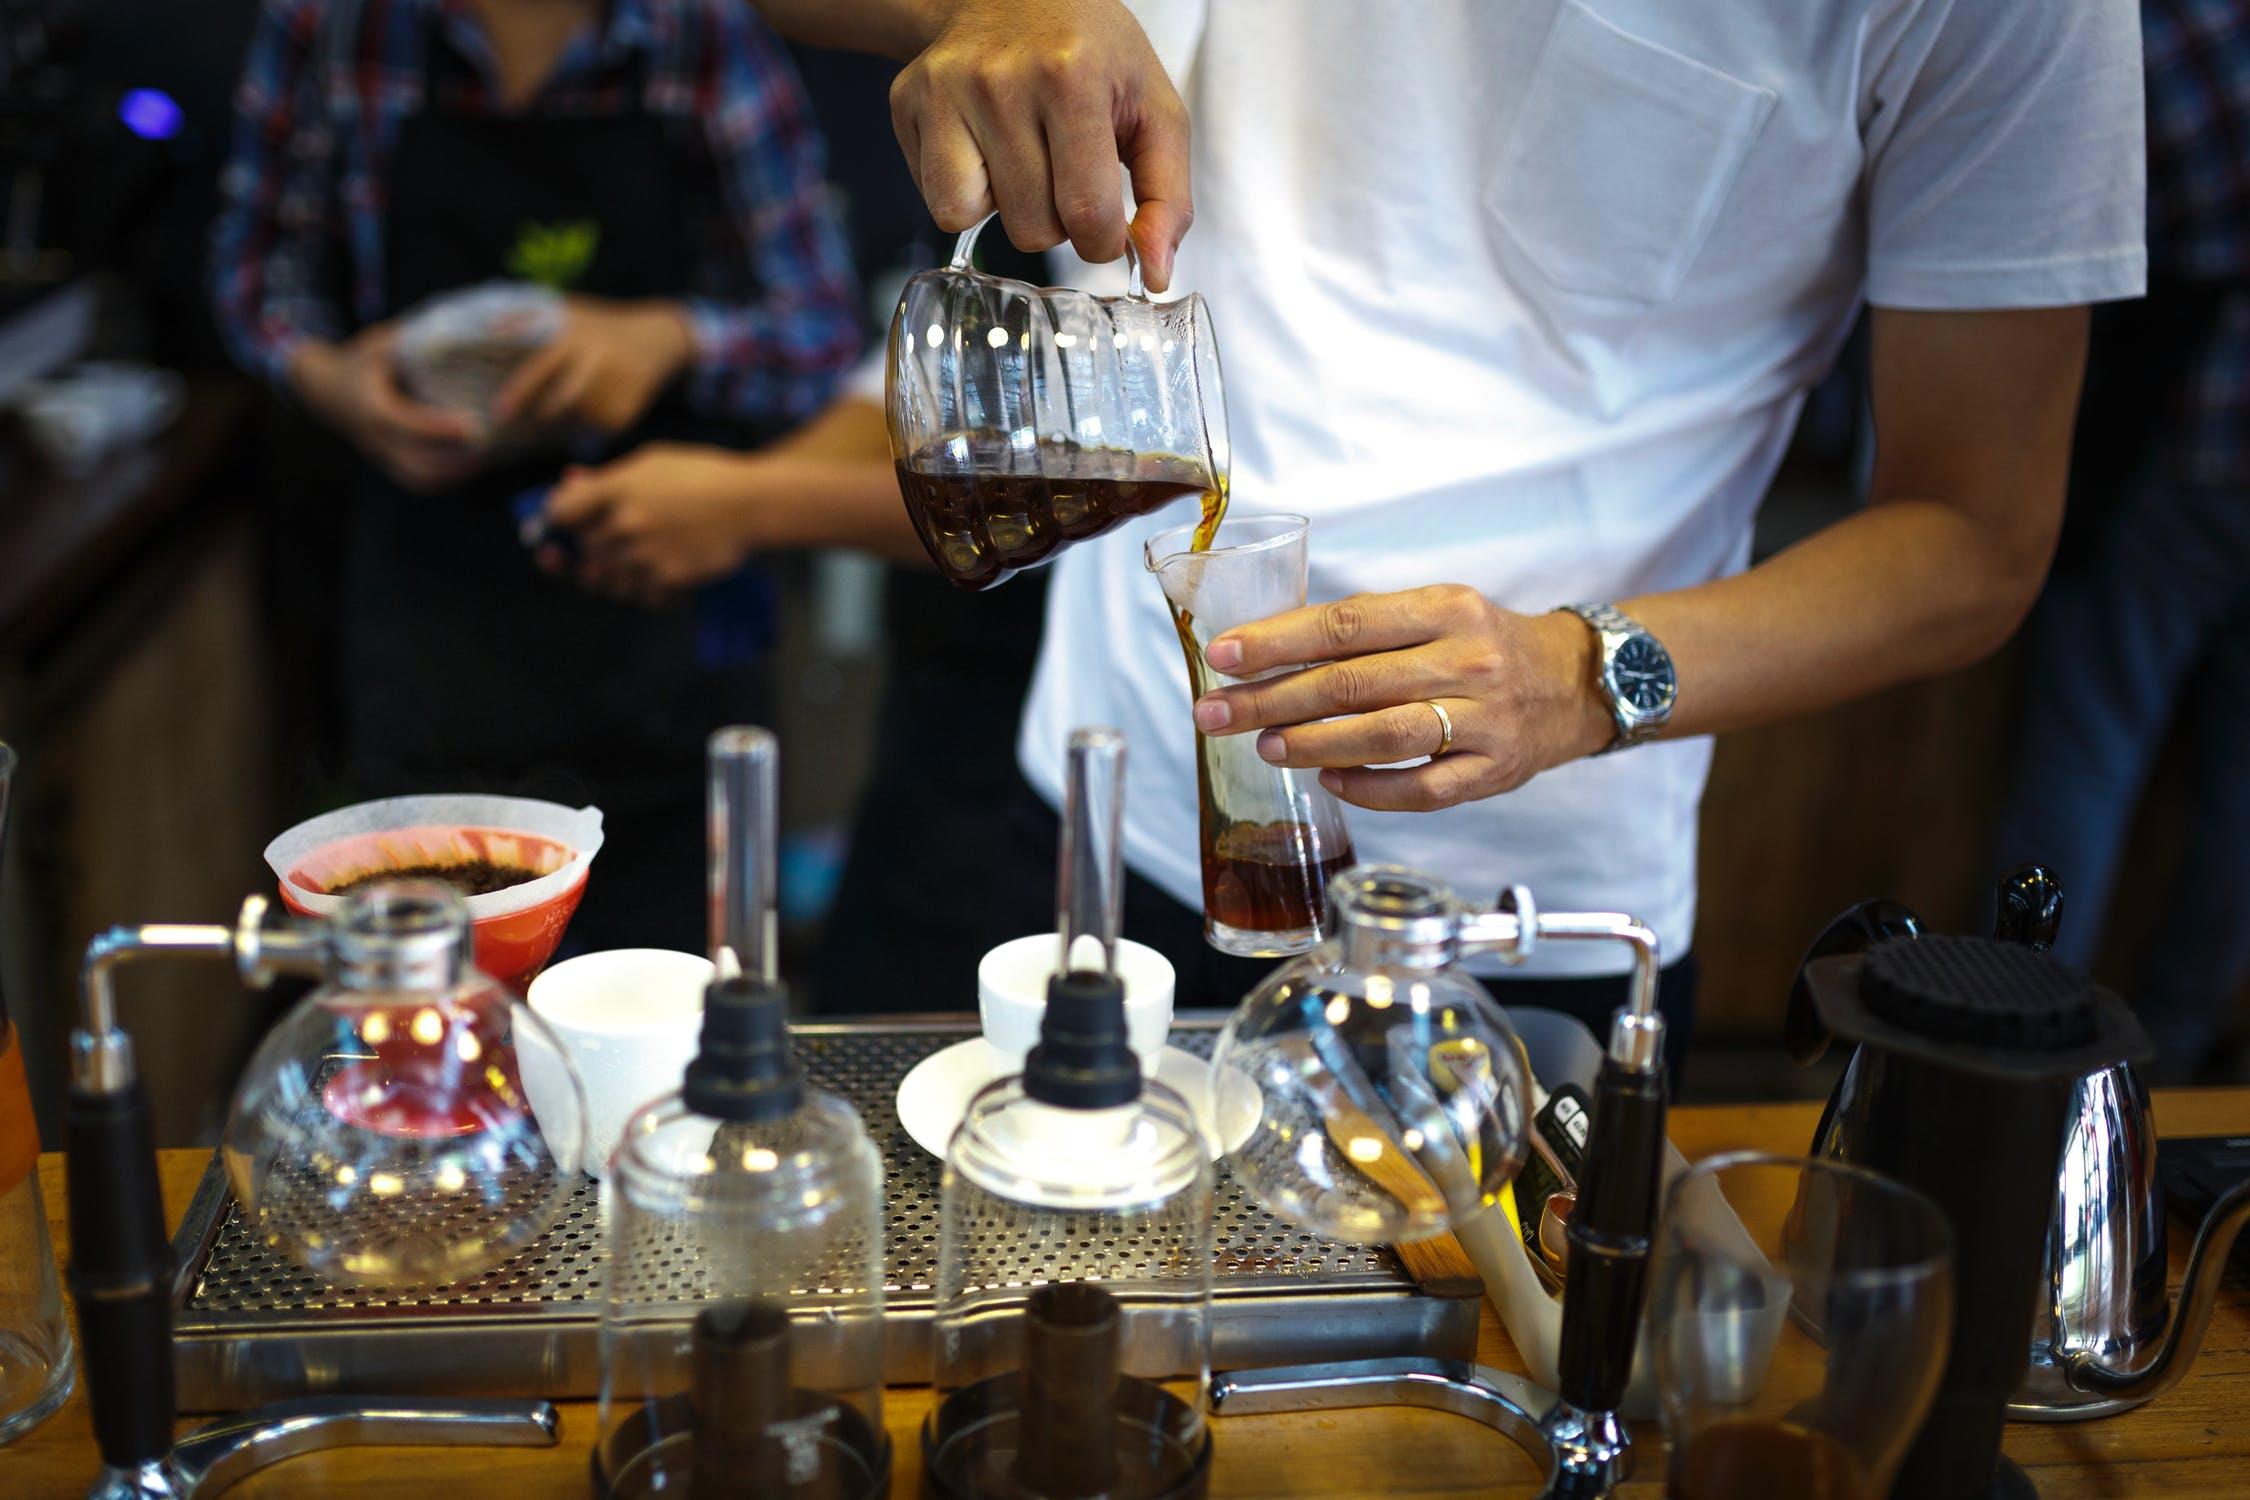 waarom buikpijn na koffie